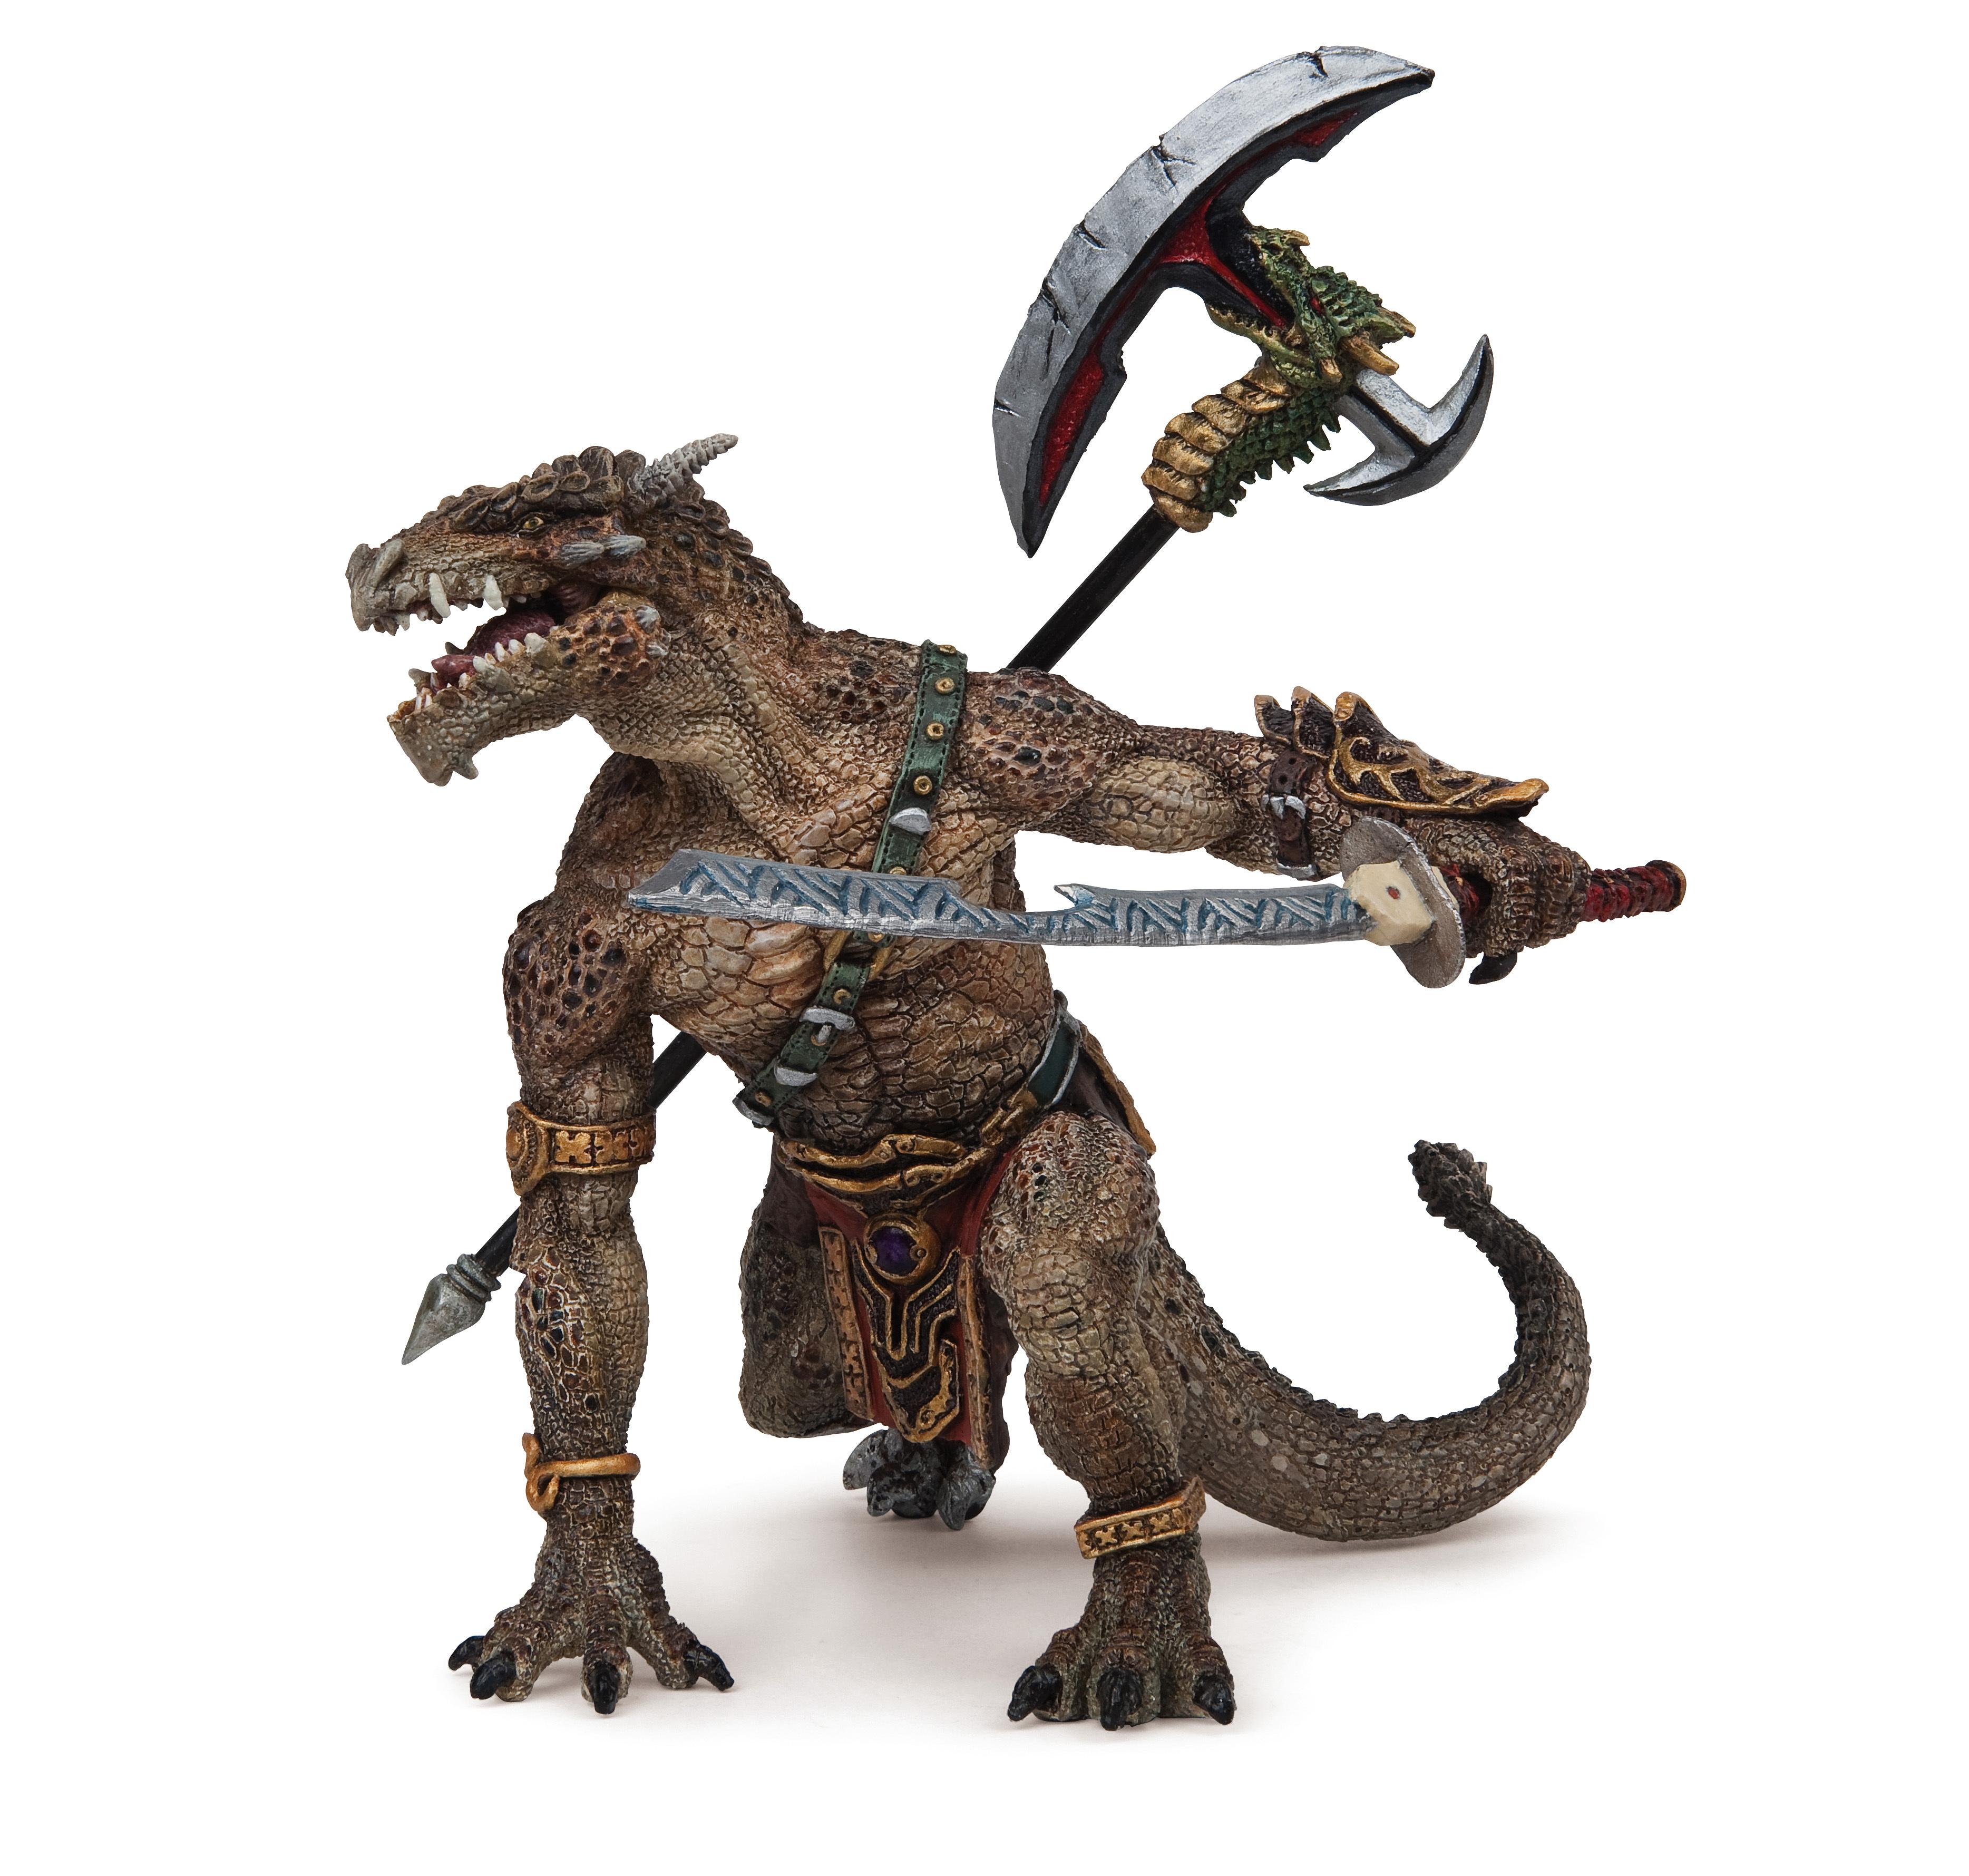 Mutant dragon - PAPO - 38975